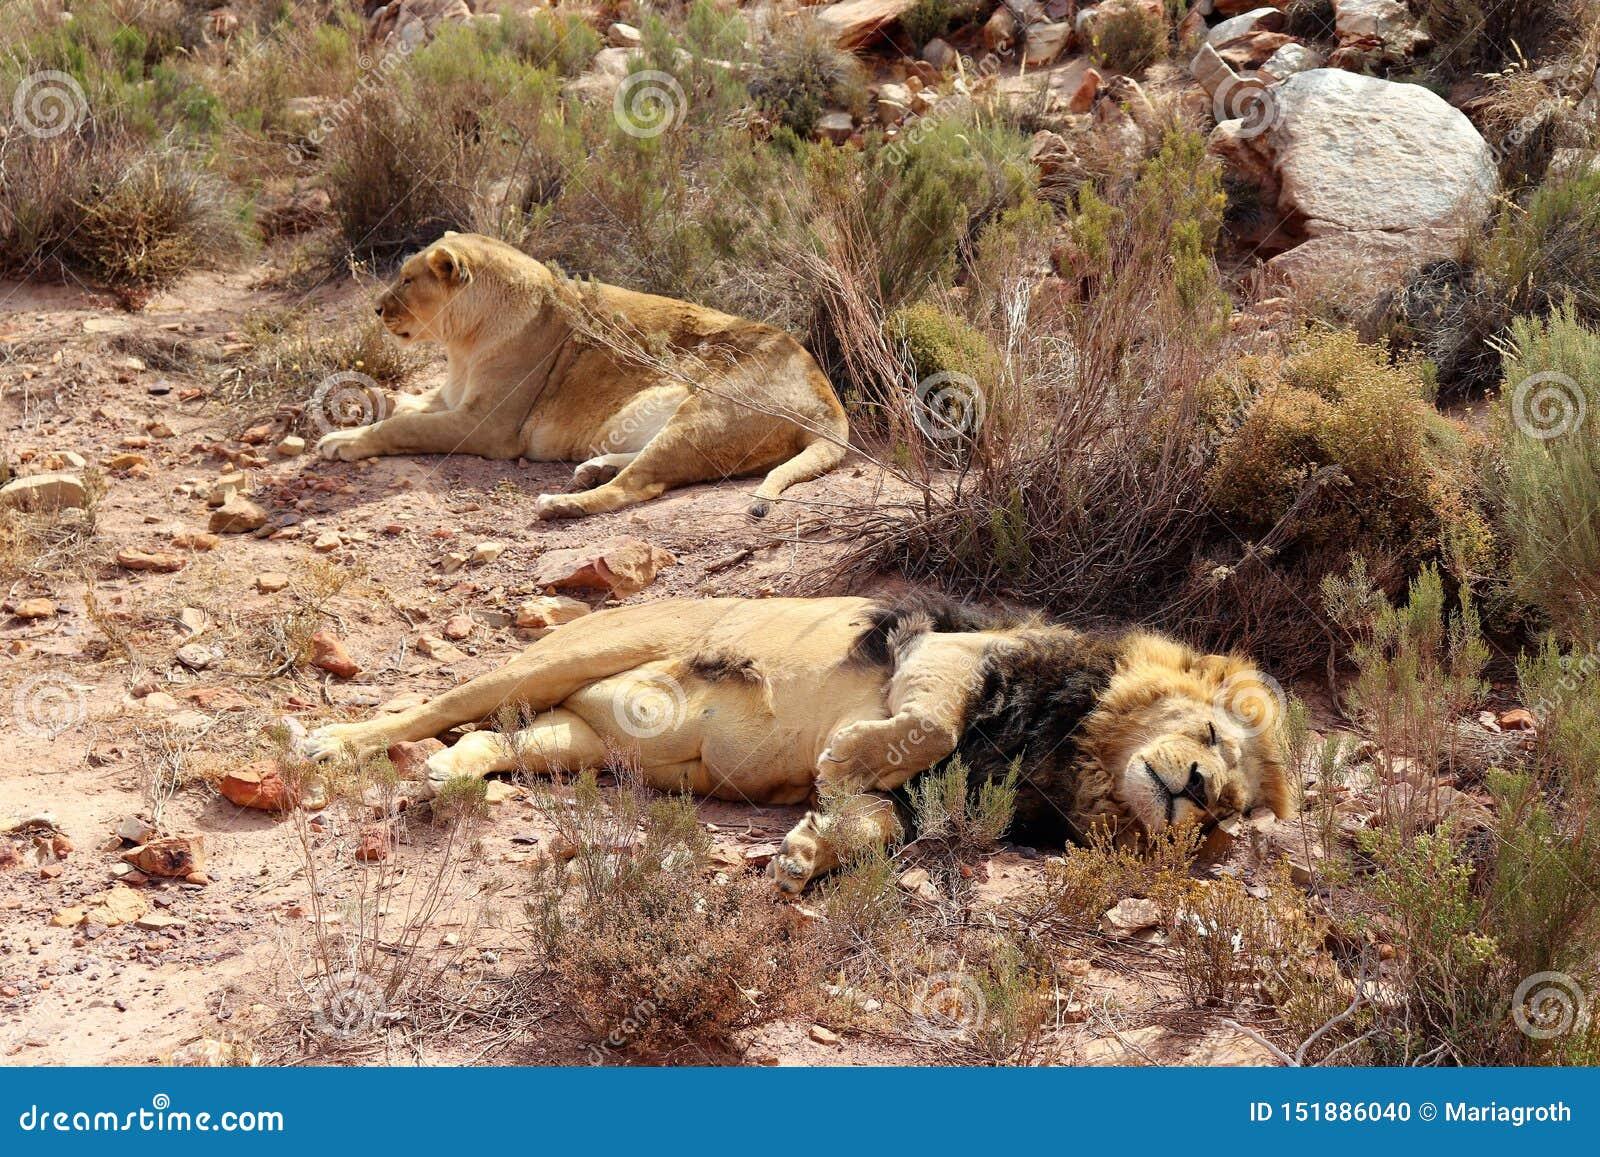 The lion is Africa`s largest terrestrial predator